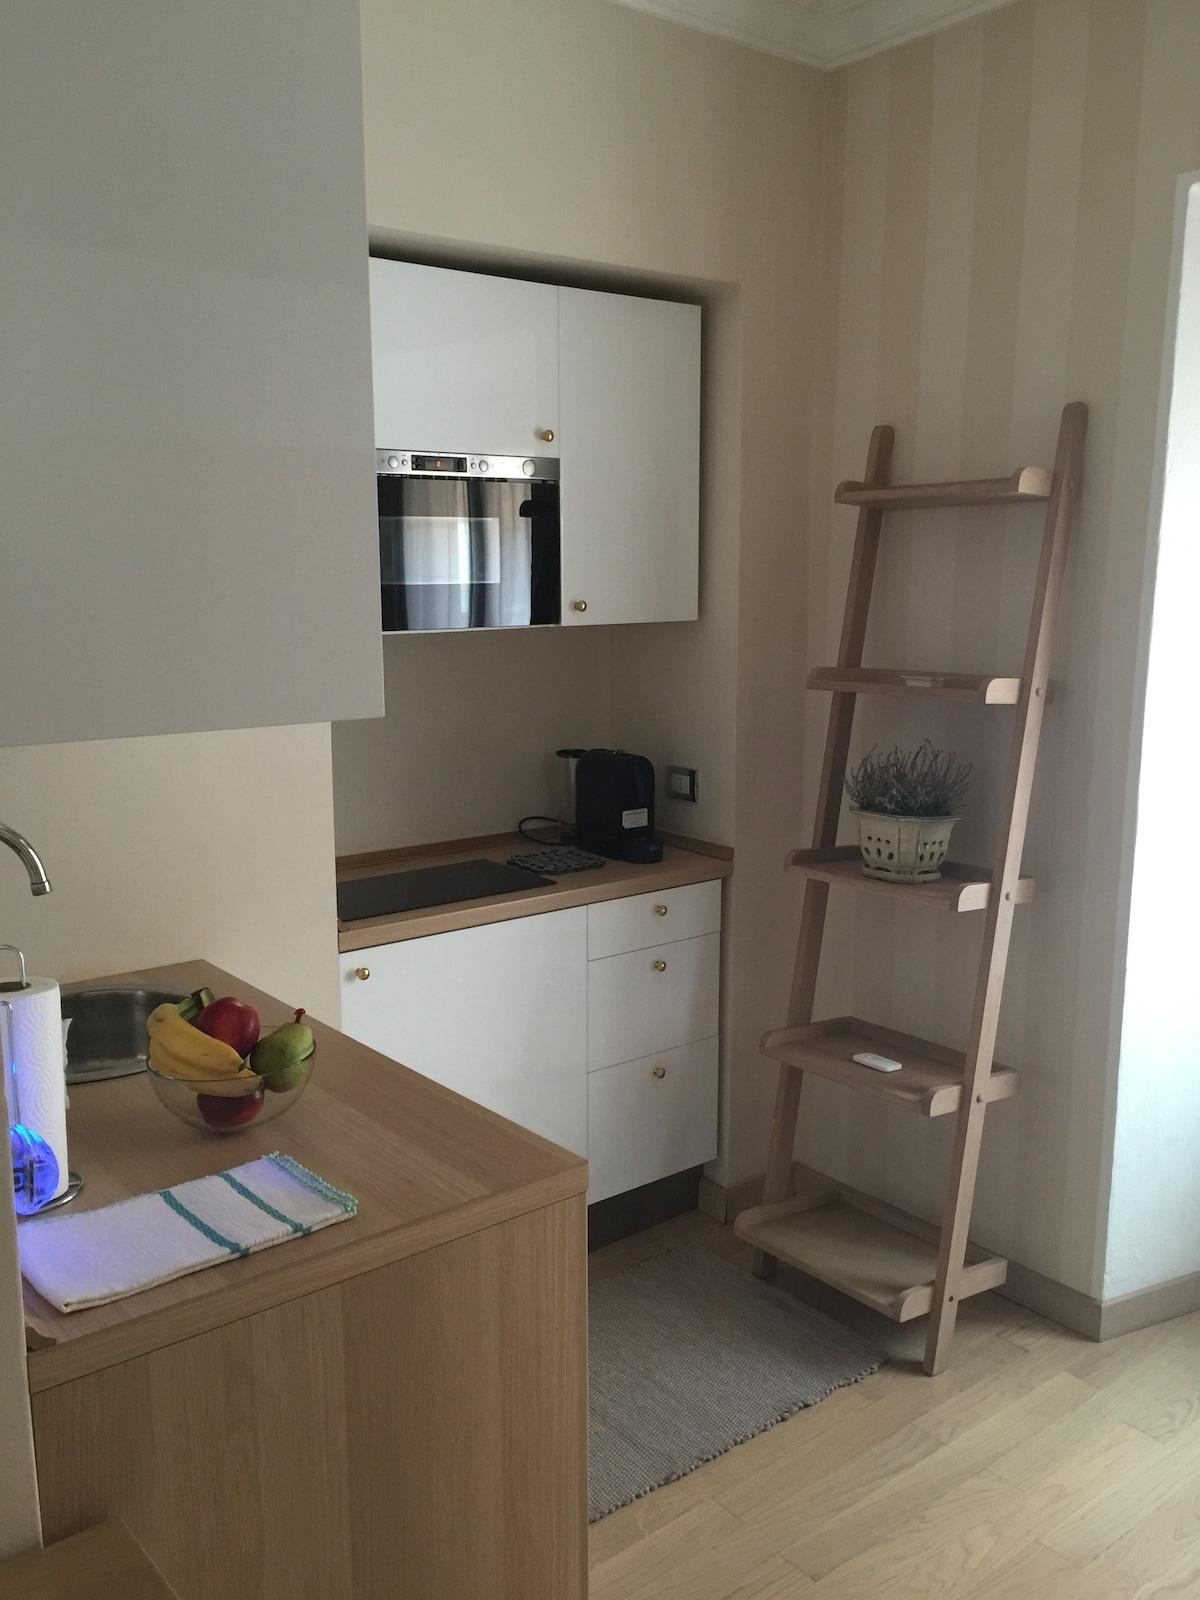 Attractive MONOLOCALE BRERA   Apartments For Rent In Milano, Lombardia, Italy